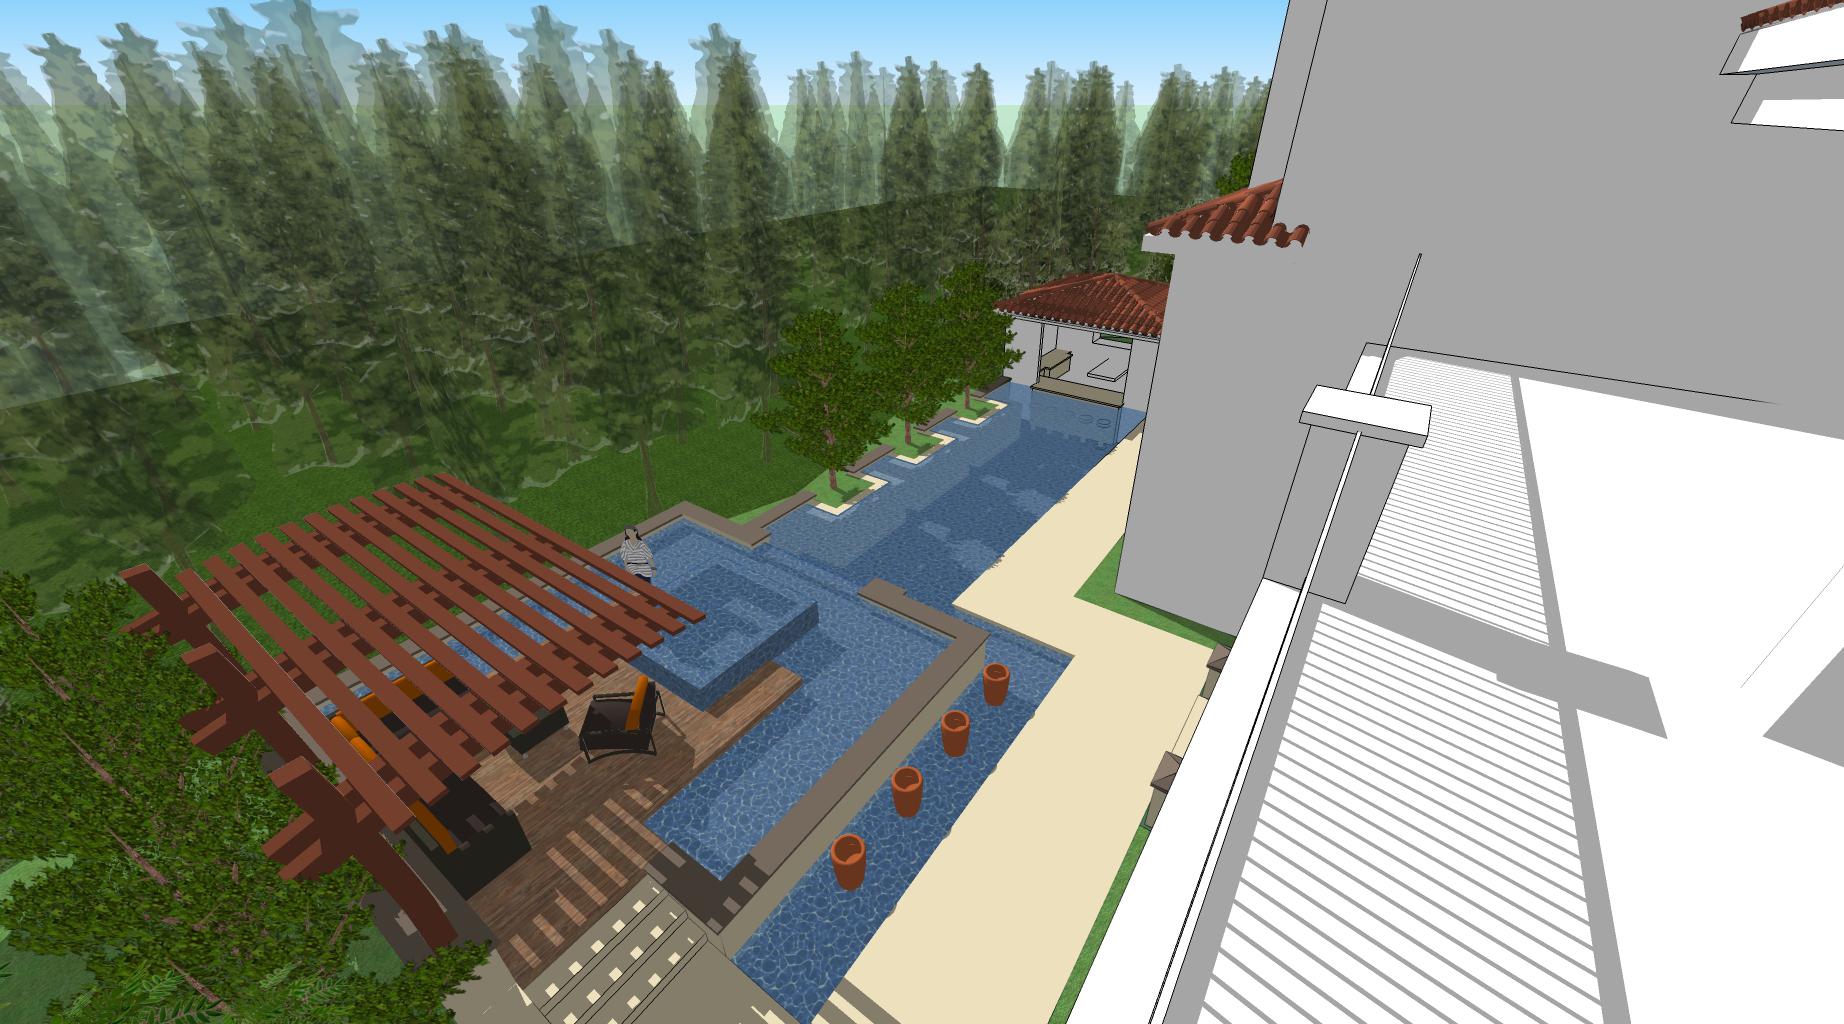 Yantai-RG & Villas Perspective 07.JPG